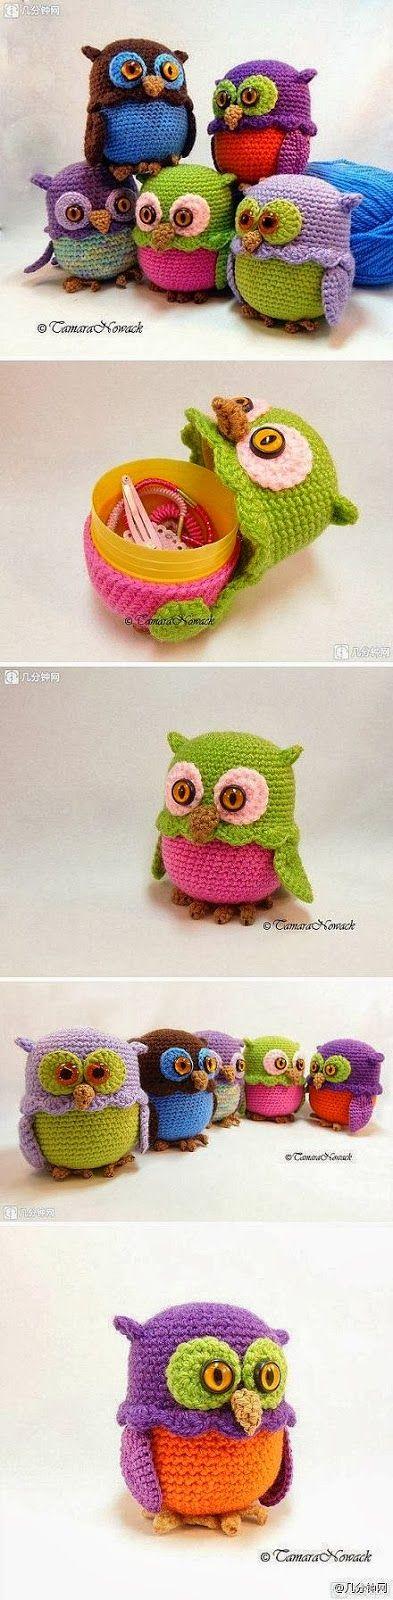 Pūces, pūcītes (owl)